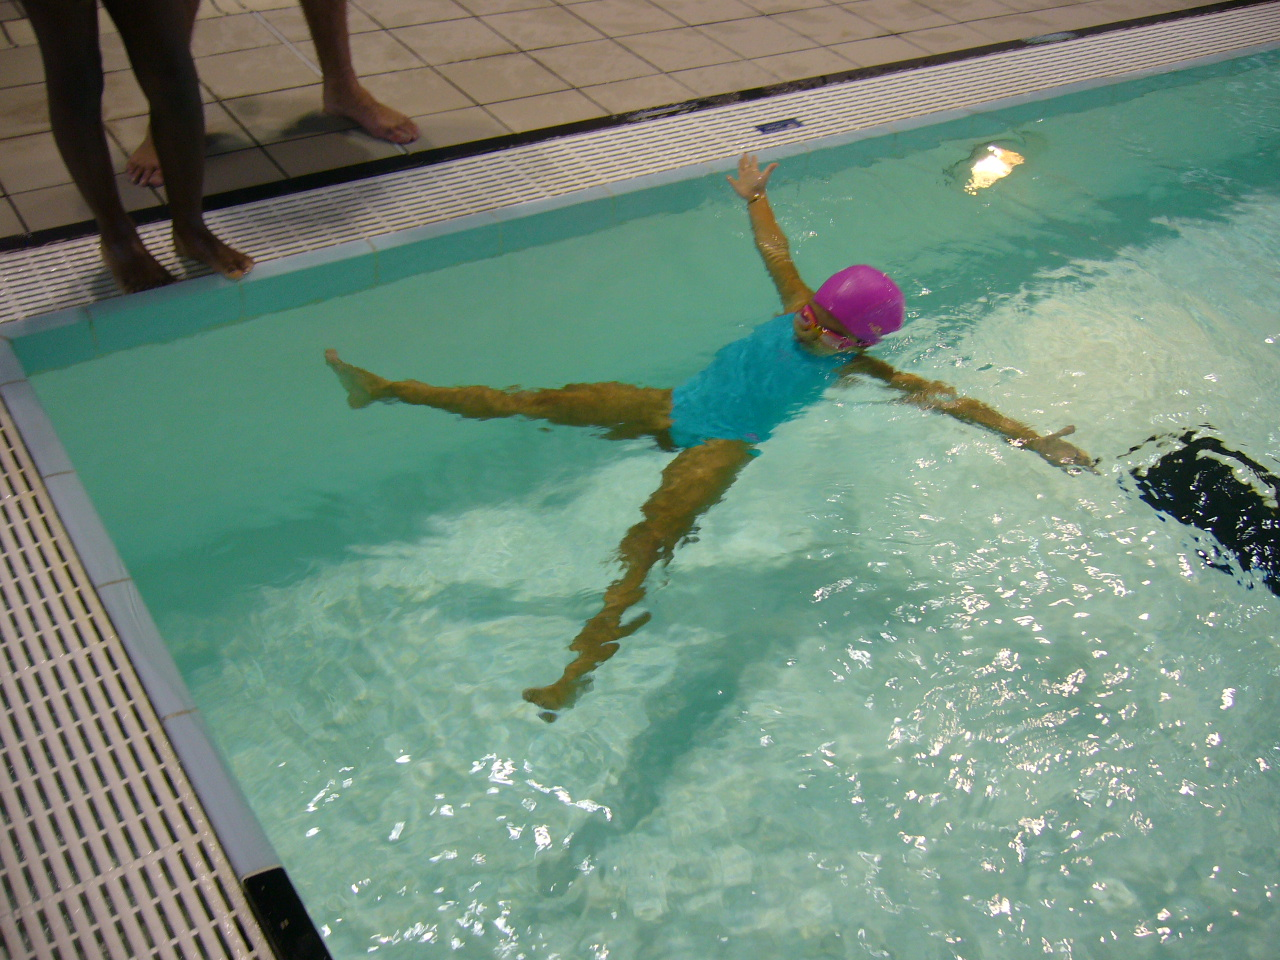 Classe de cp ce1 et ce1 ce2 derni re s ance de piscine for Piscine quetigny